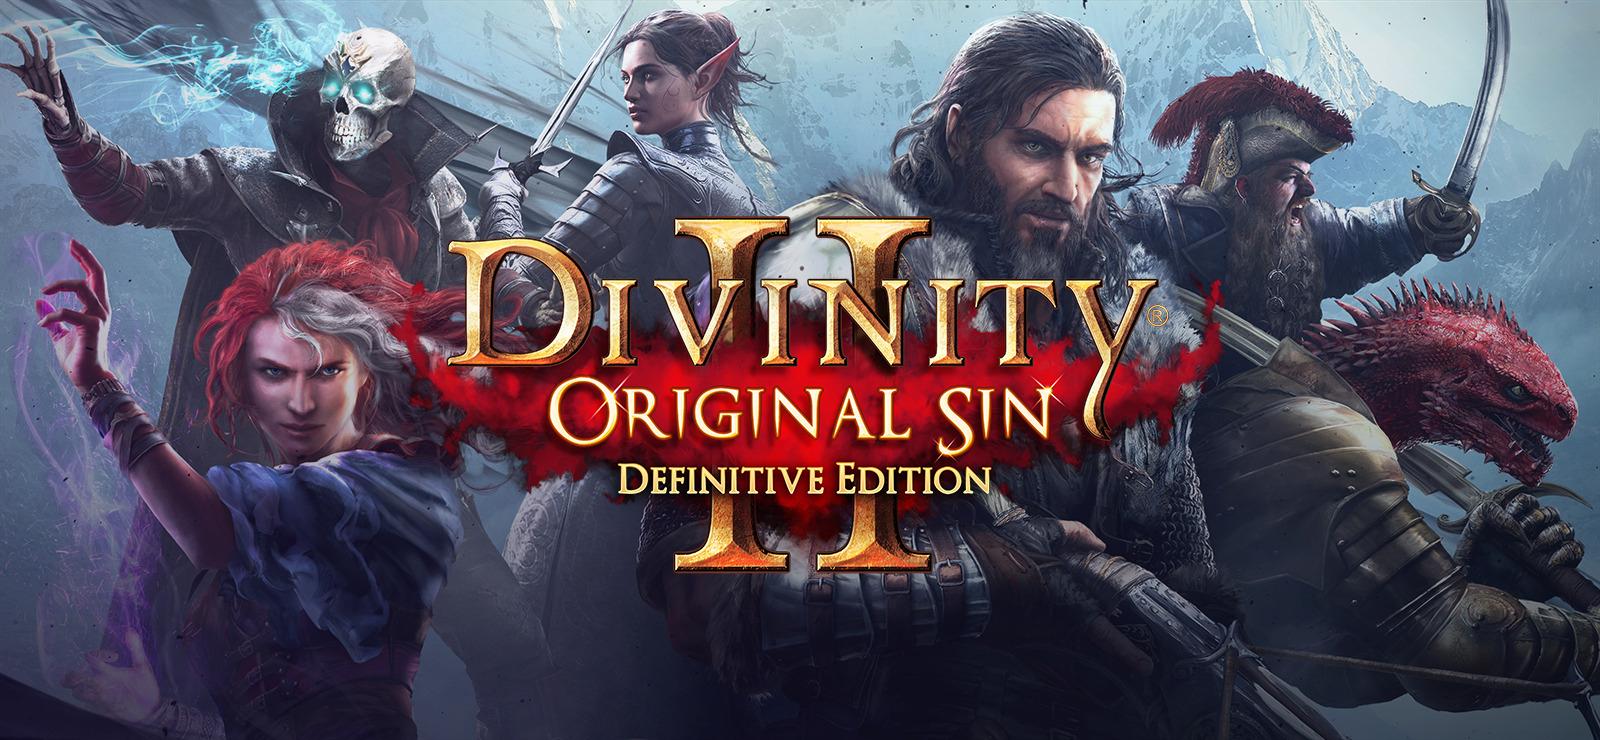 Divinity: Original Sin 2 - Definitive Edition PC £11.99 at GOG.com